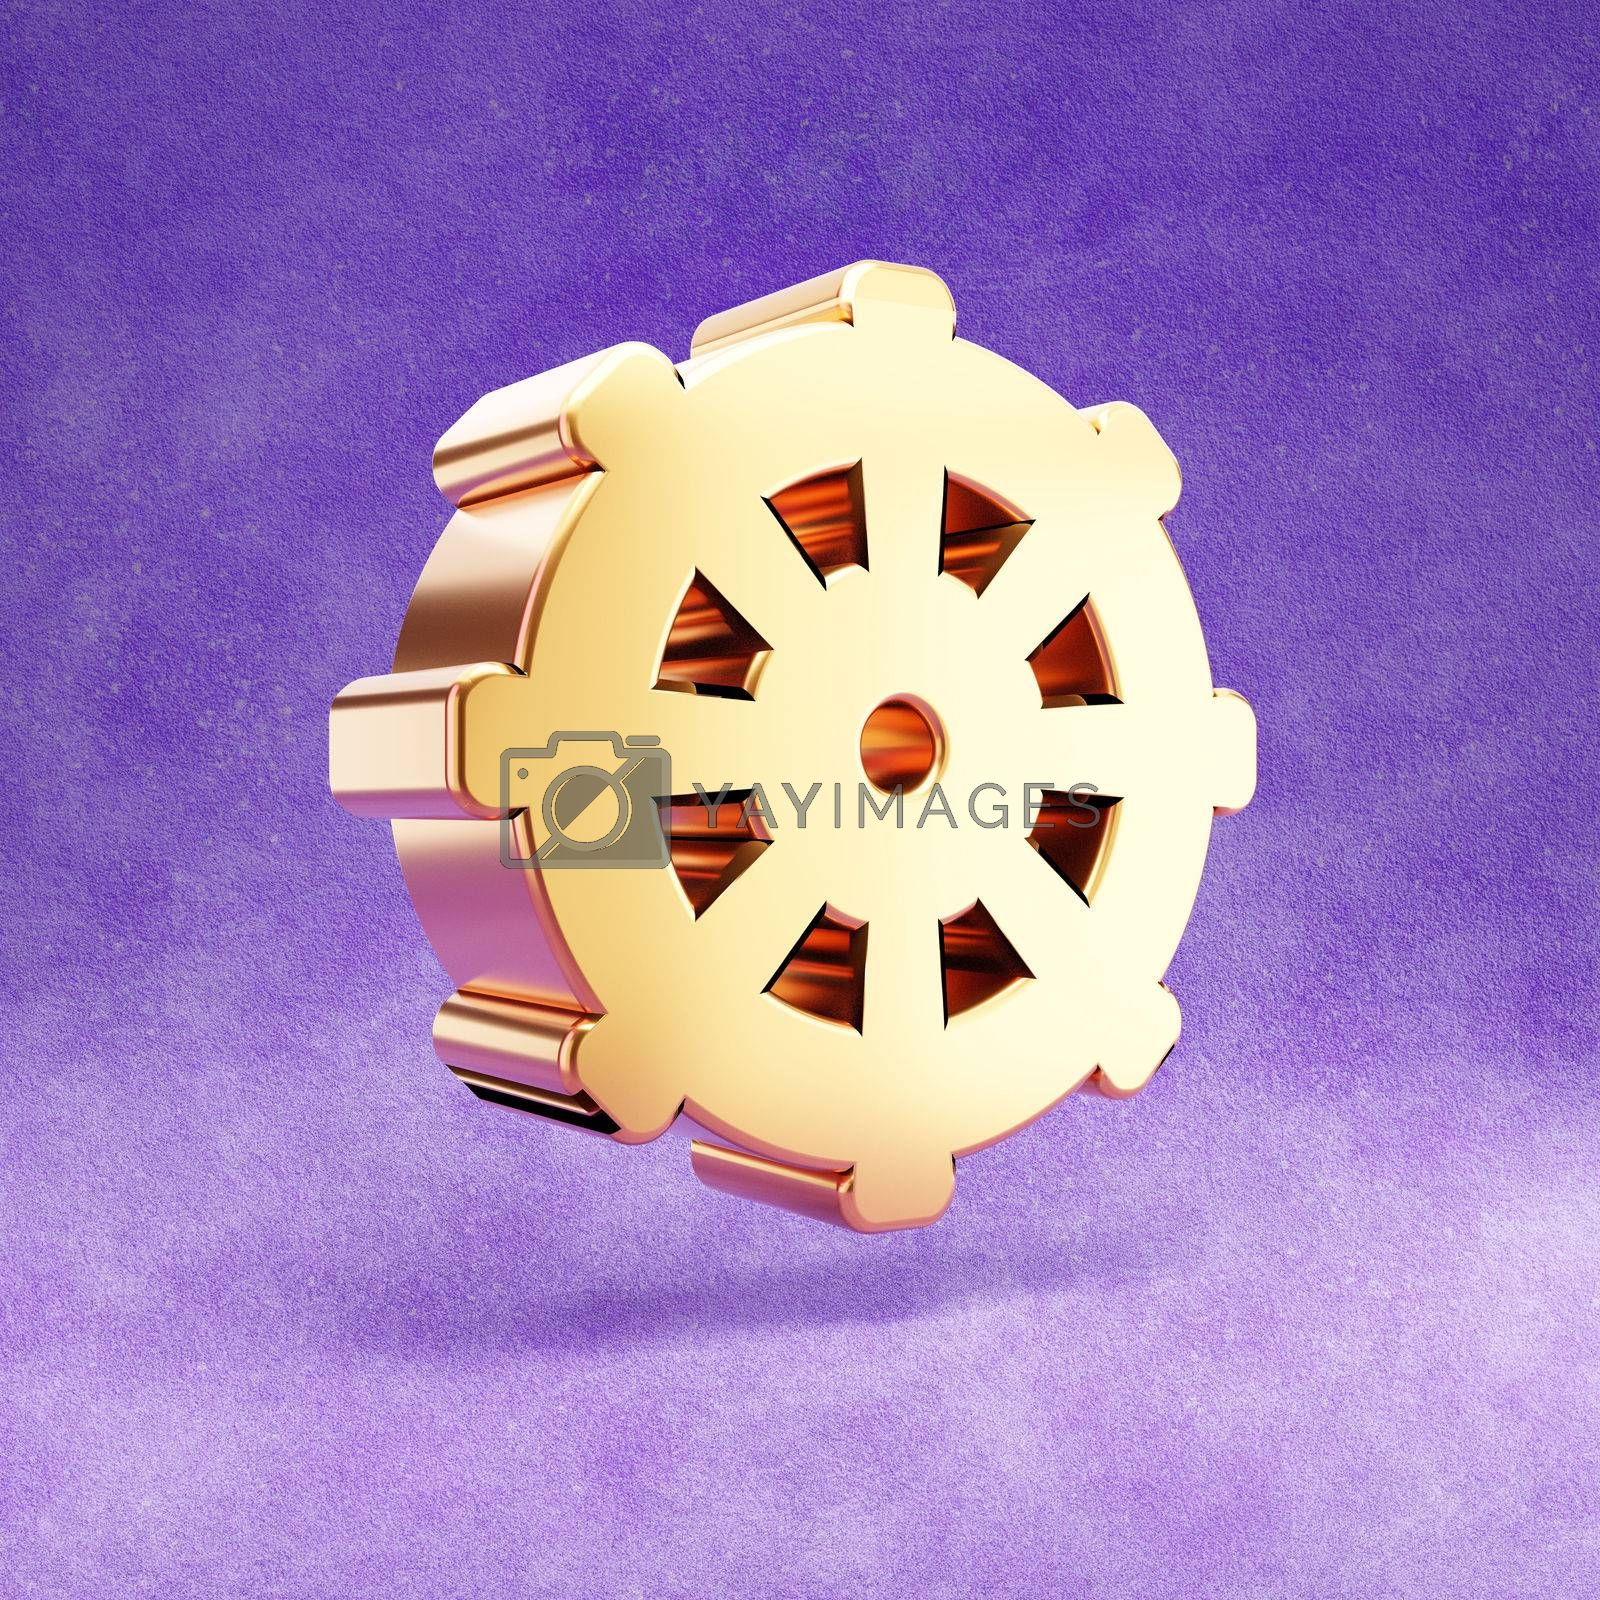 Dharmachakra icon. Gold glossy Dharmachakra symbol isolated on violet velvet background. Modern icon for website, social media, presentation, design template element. 3D render.